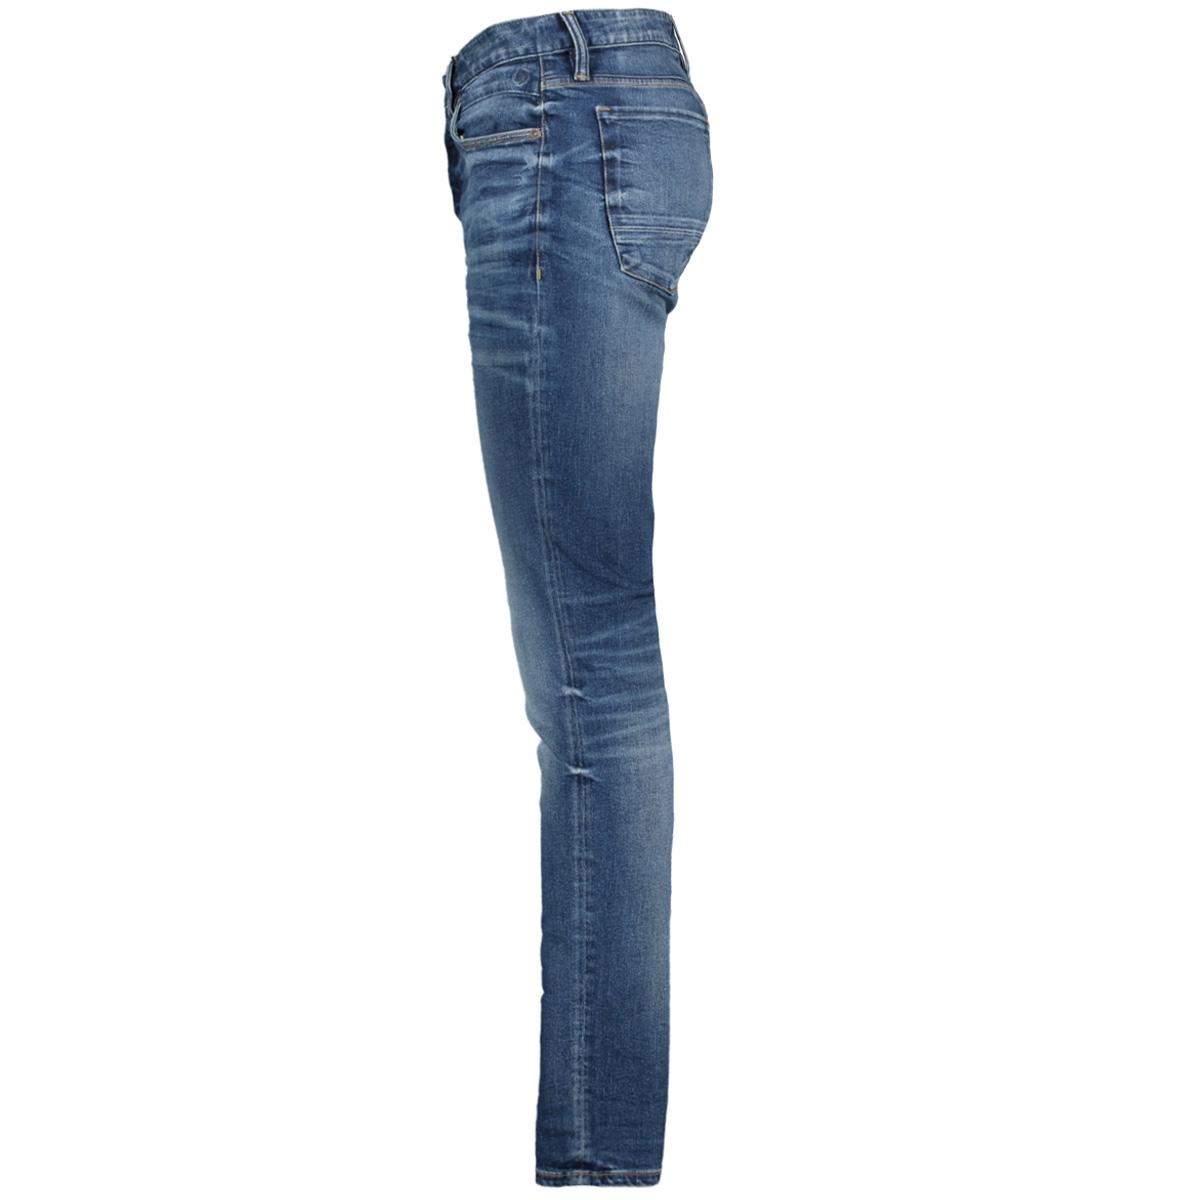 riser slim ctr195203 cast iron jeans bde